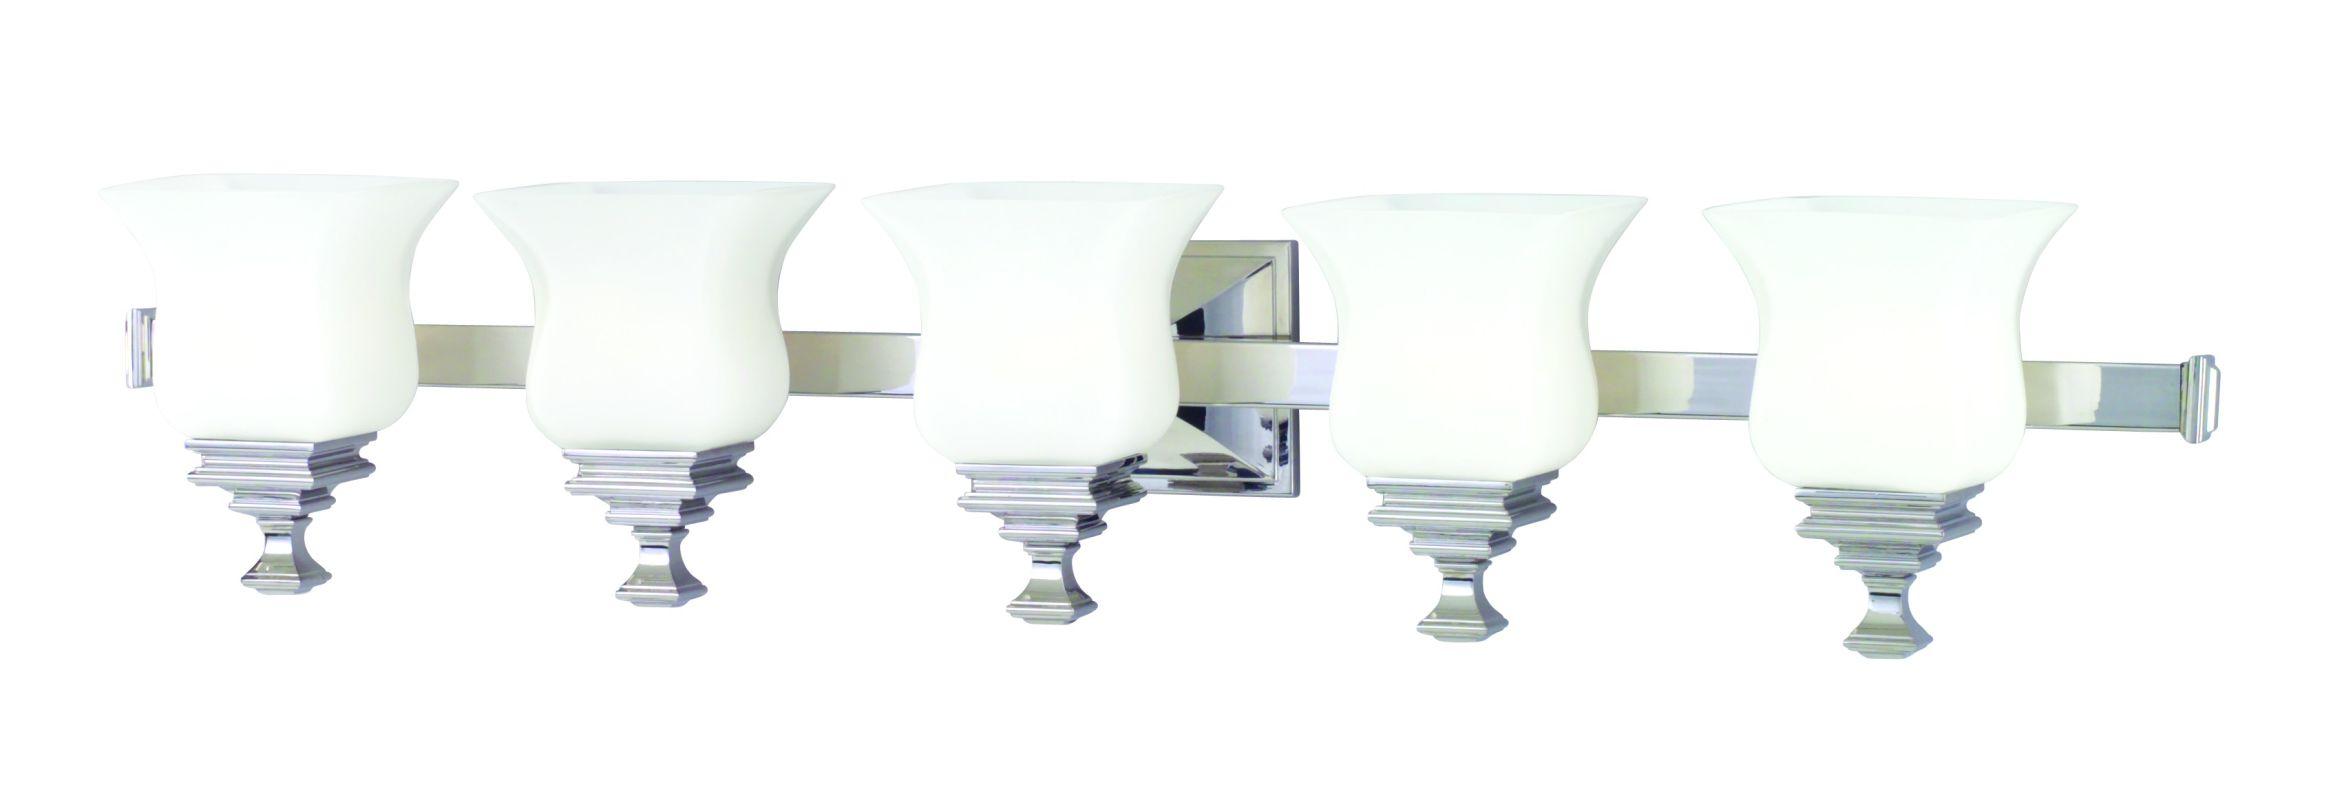 Hudson Valley Lighting 5505 Wilton 5 Light Bathroom Vanity Fixture Sale $578.00 ITEM#: 524000 MODEL# :5505-SN UPC#: 806134019600 :